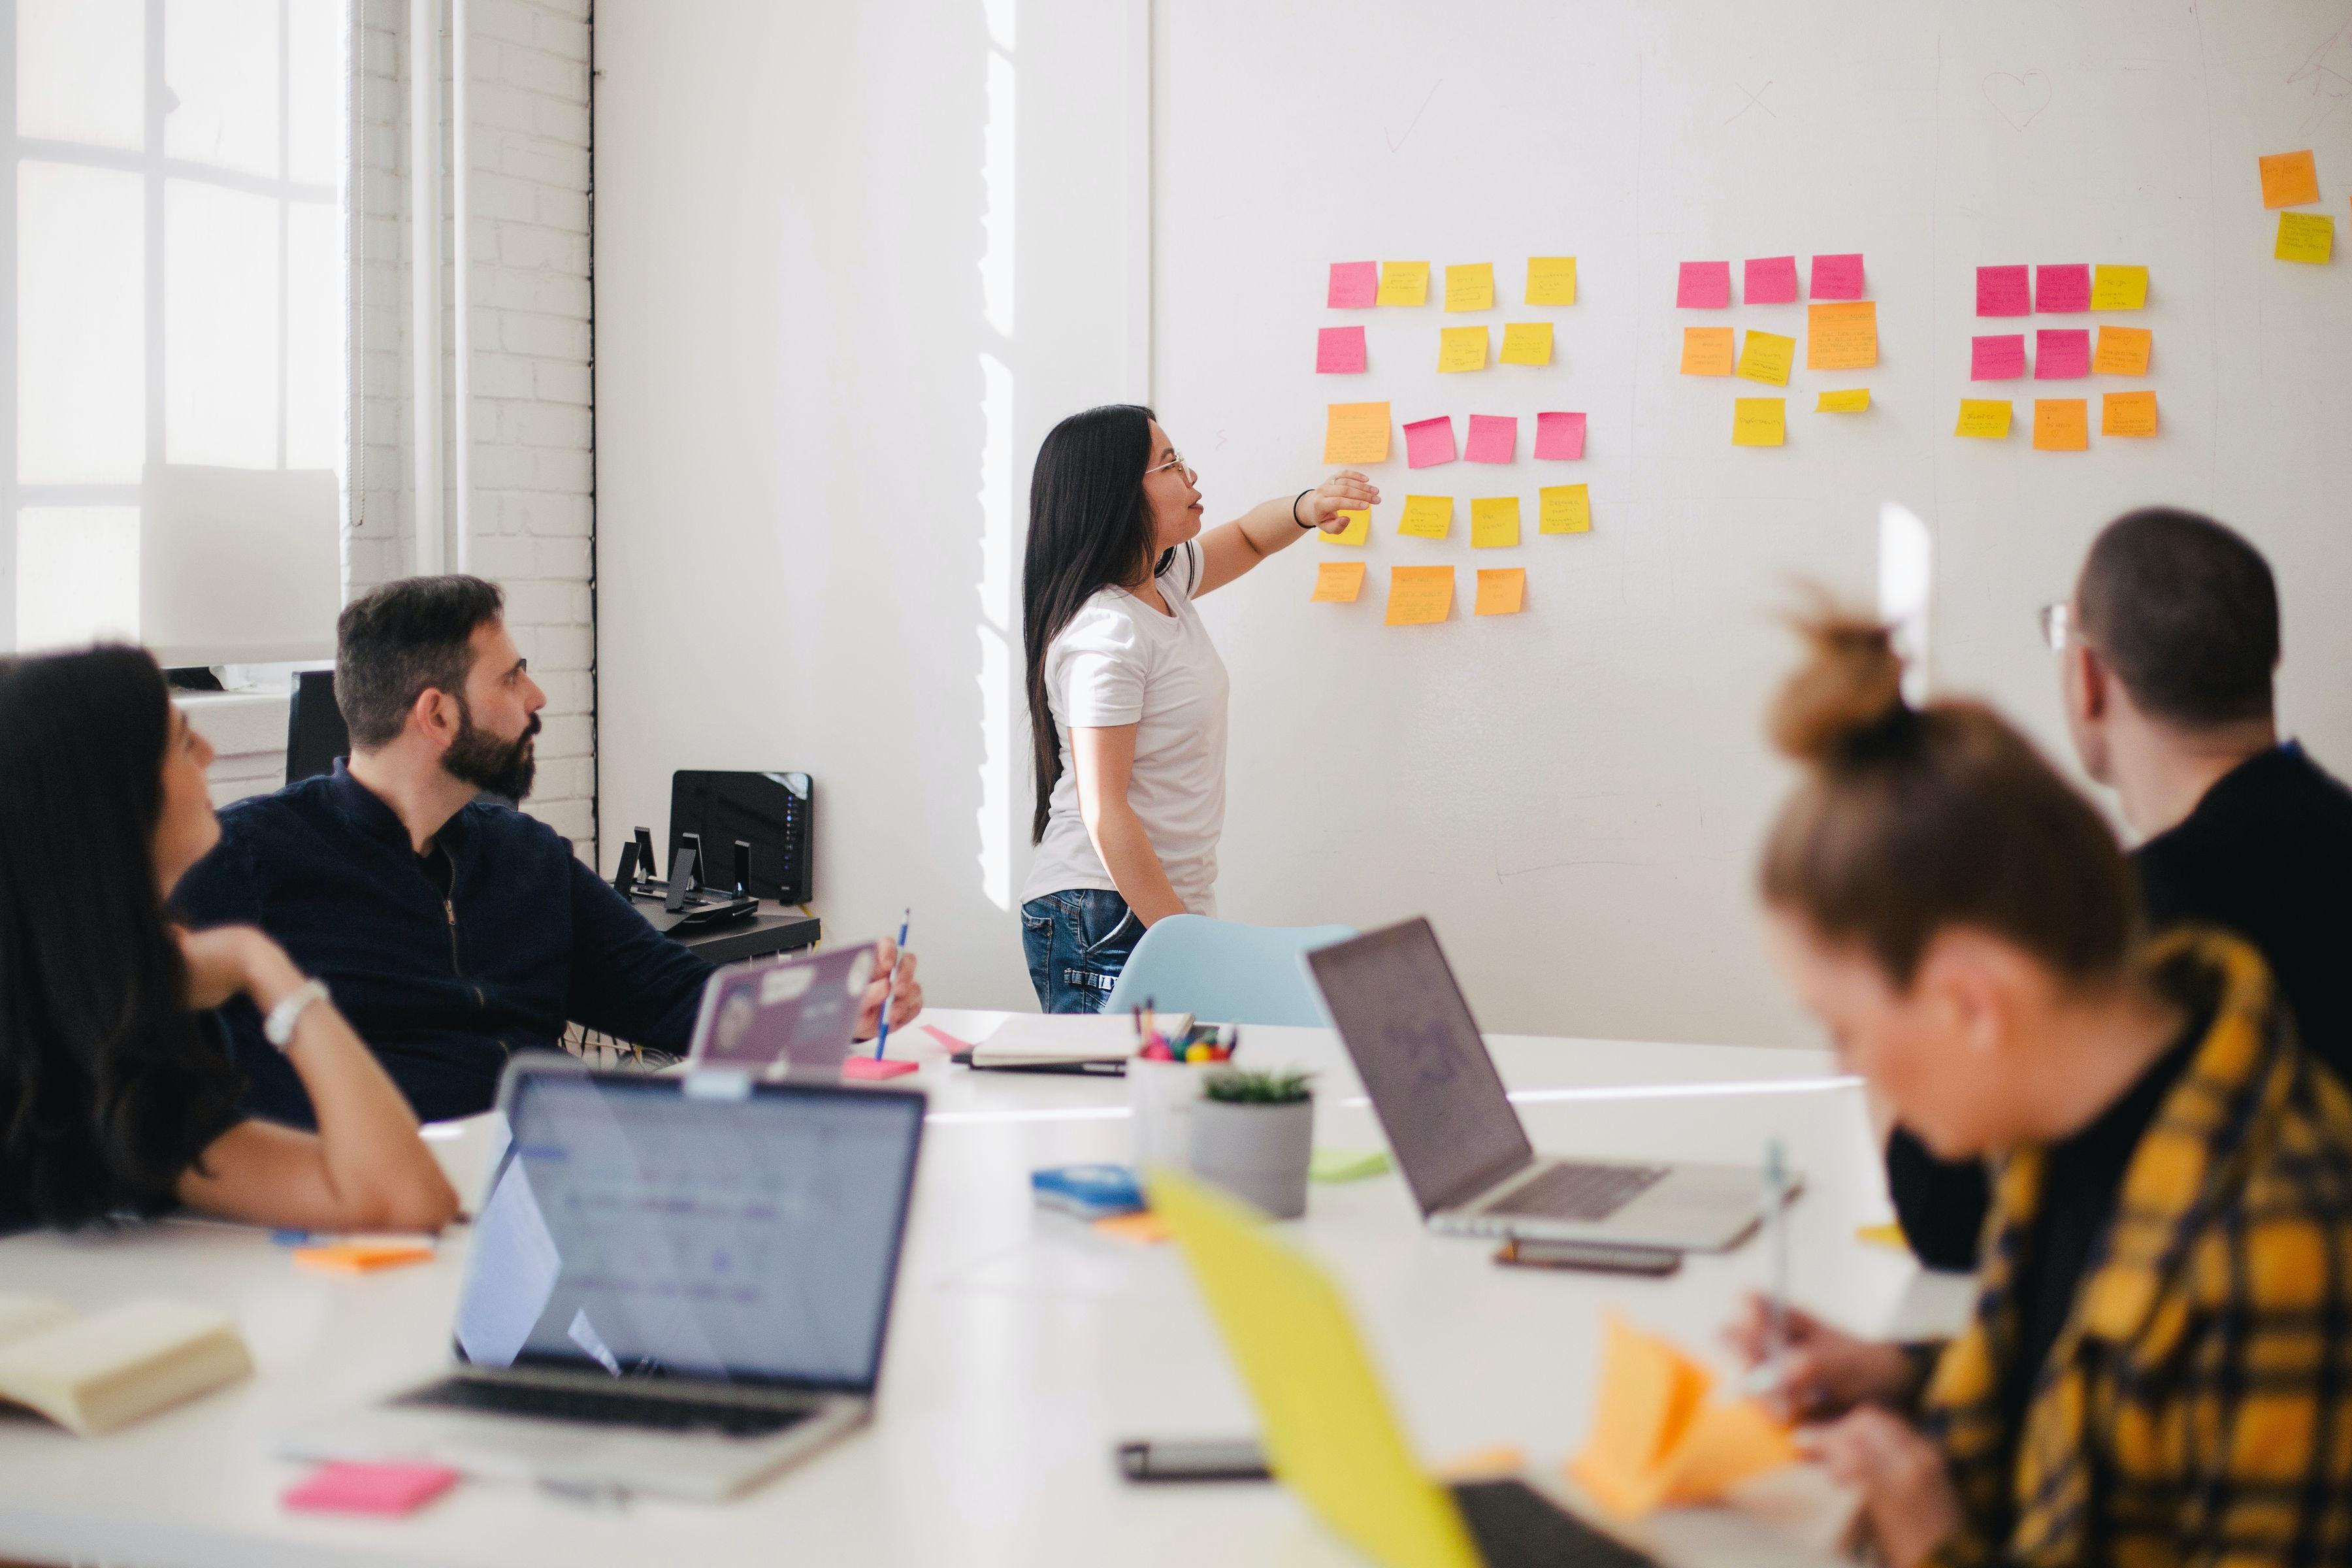 Improve your focus at work